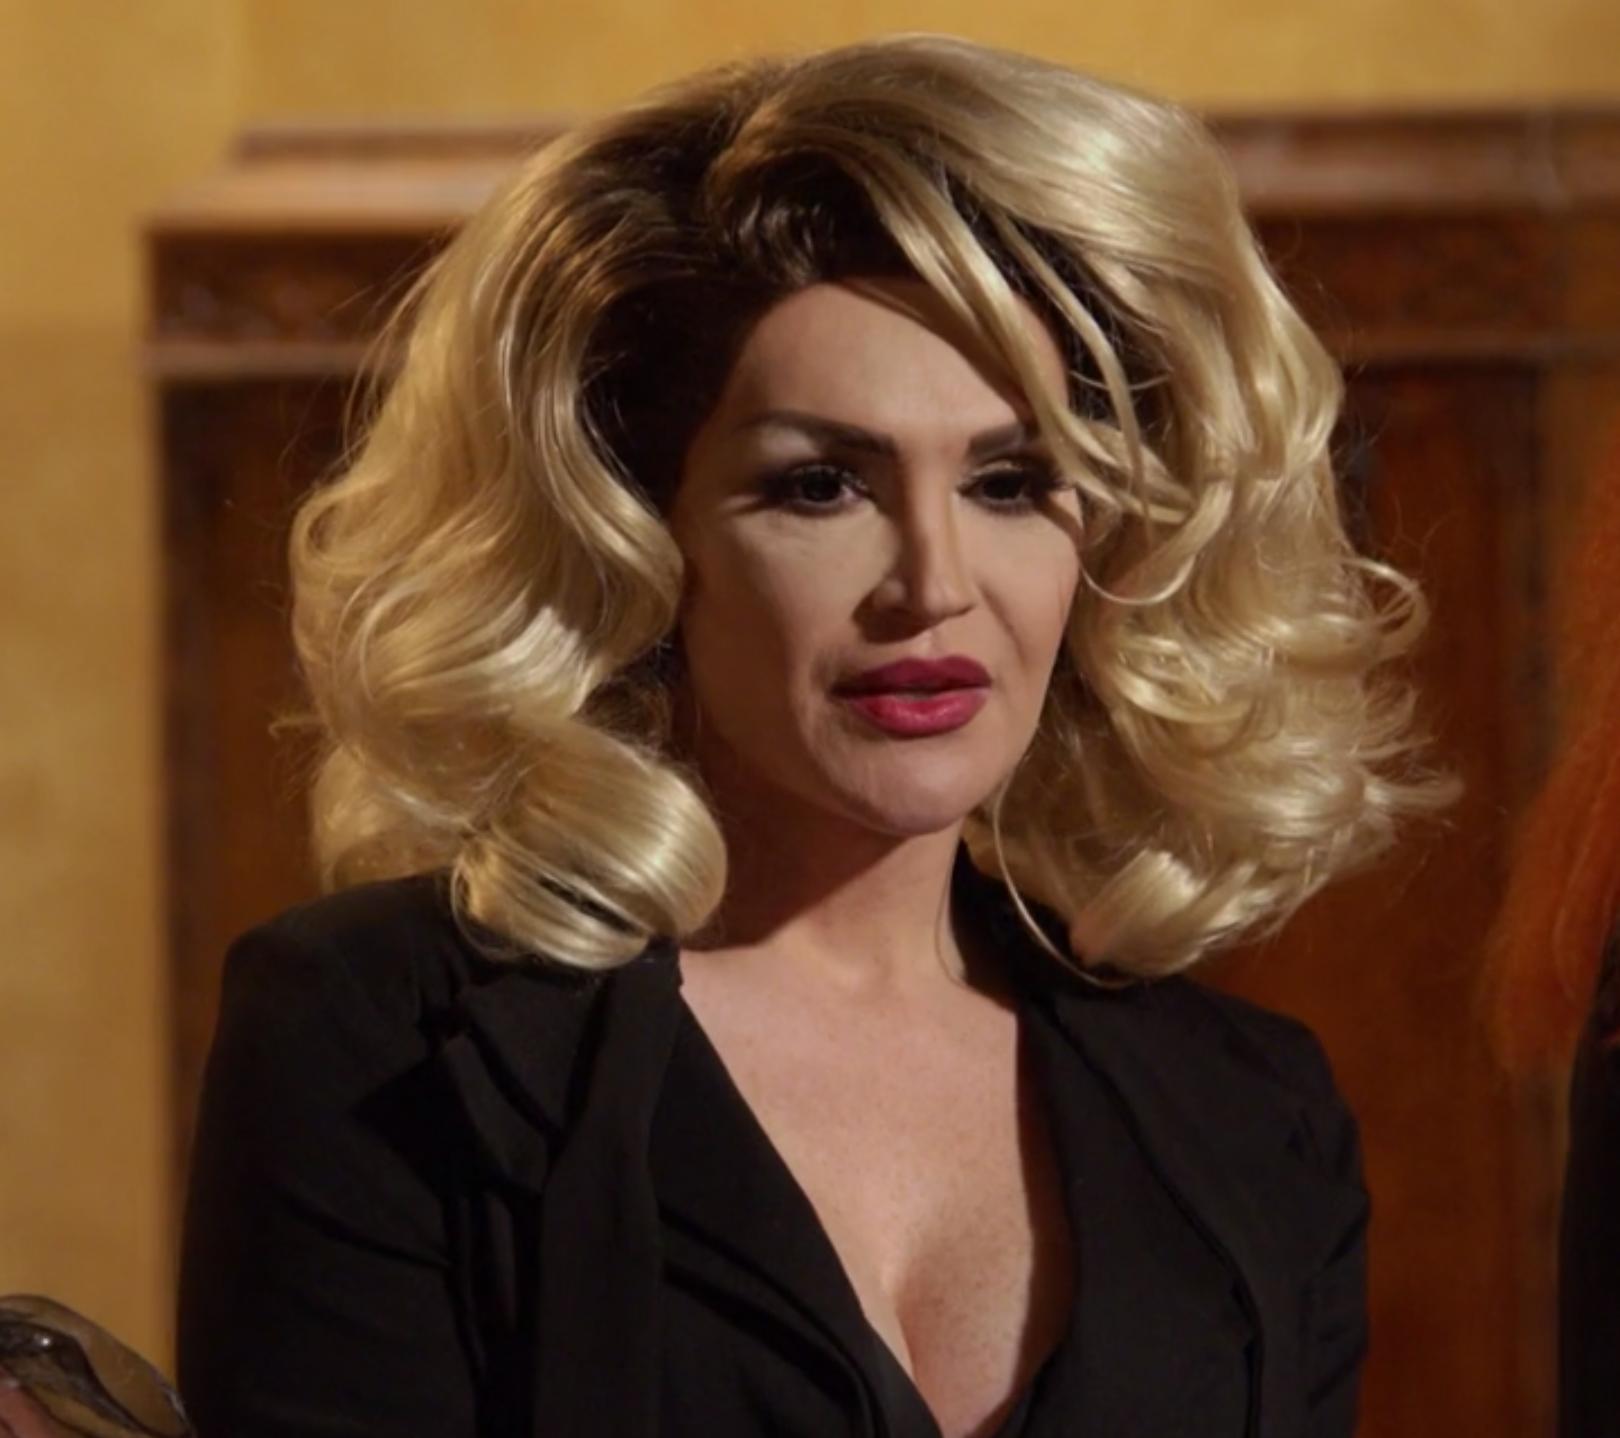 Kylie as Jessica Lange.